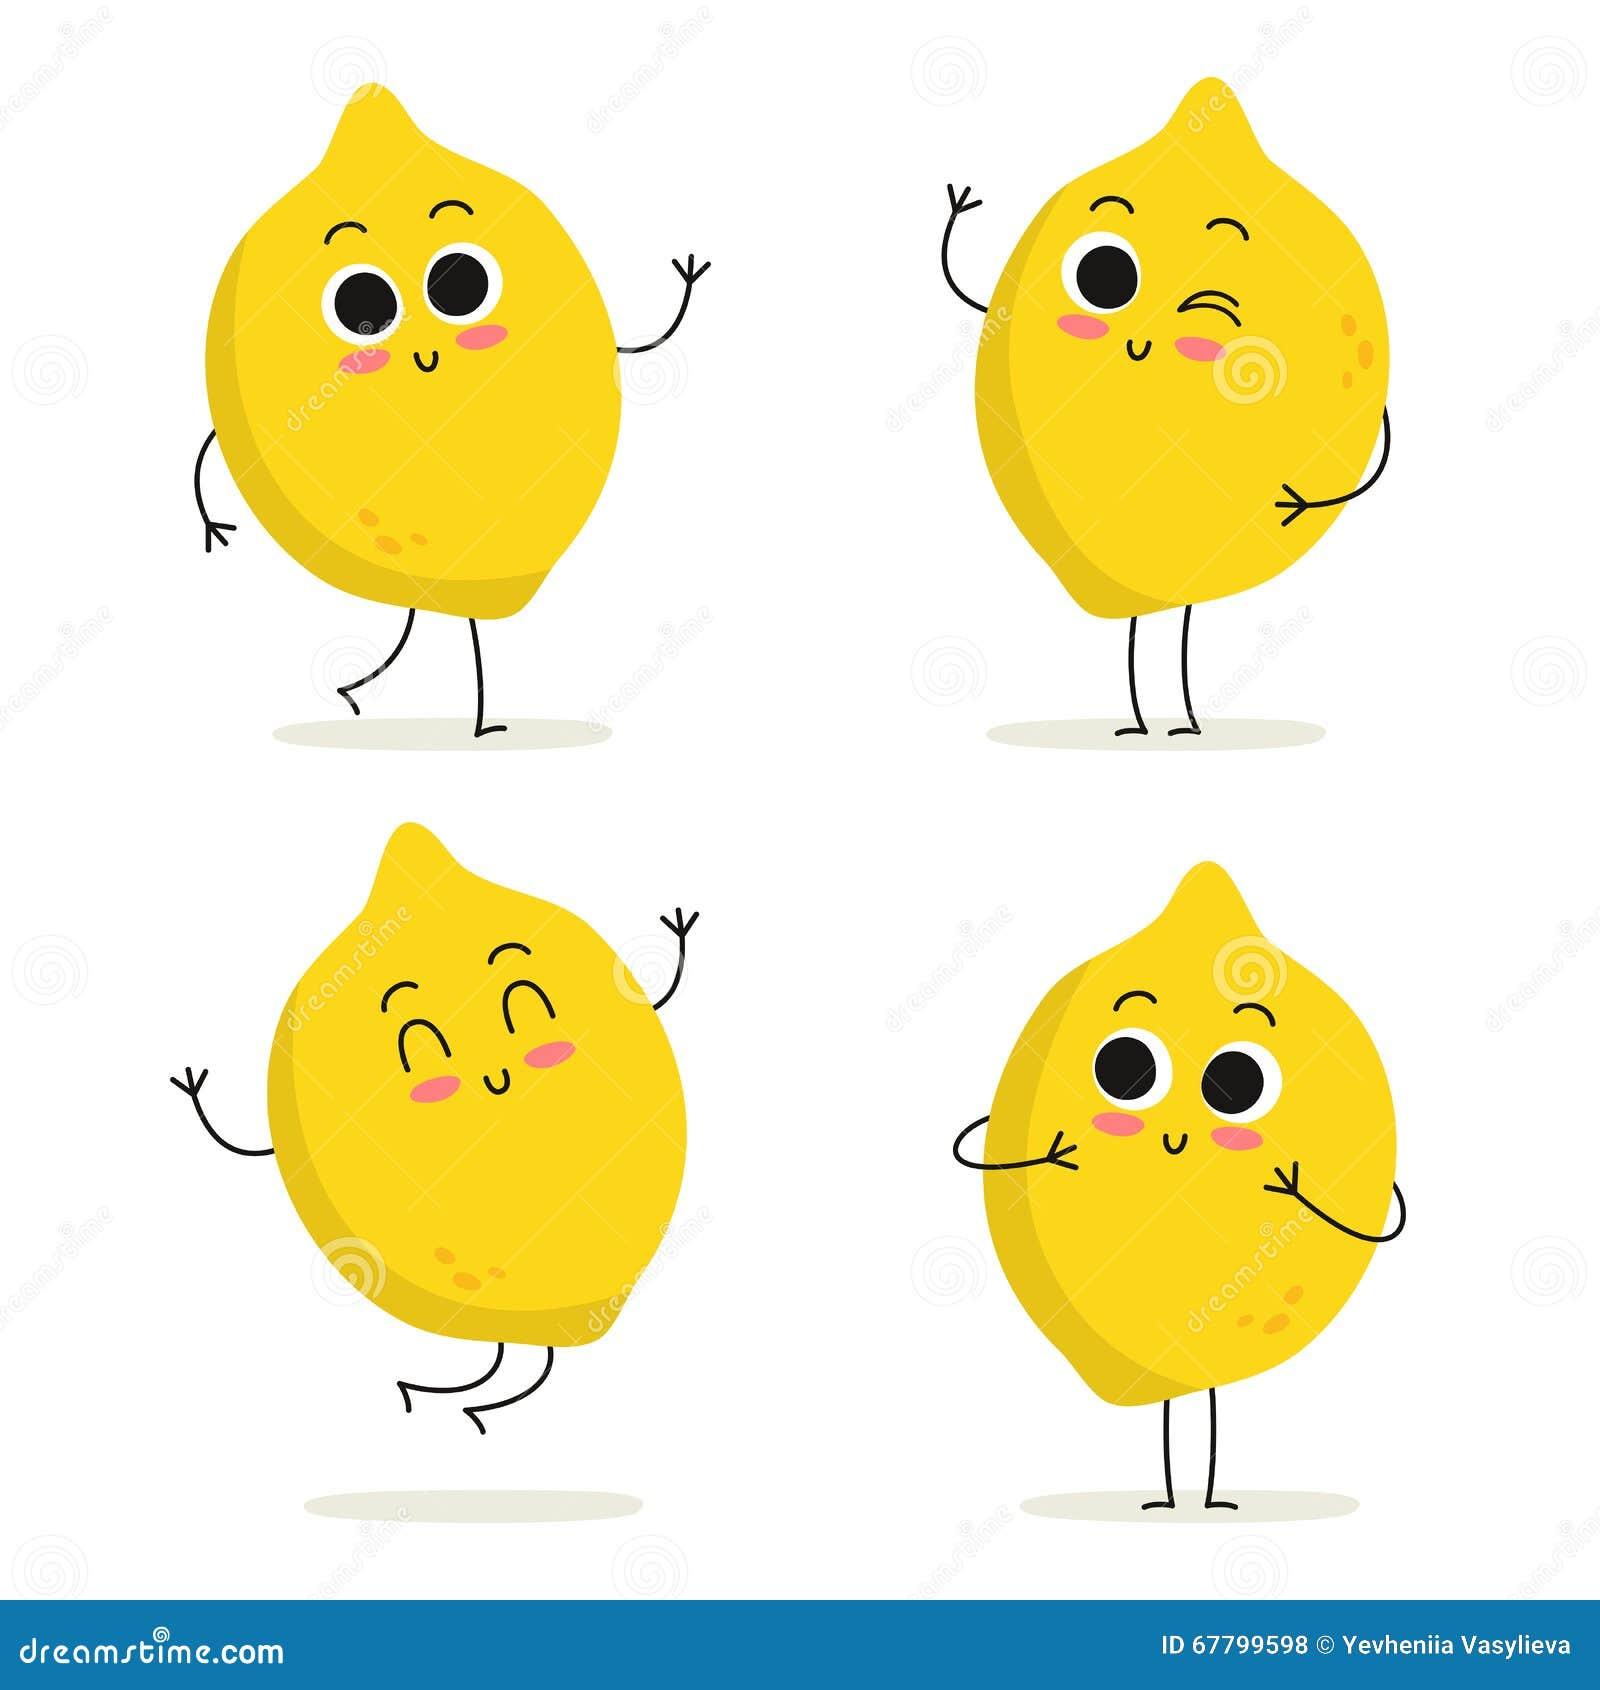 how to draw a cute lemon